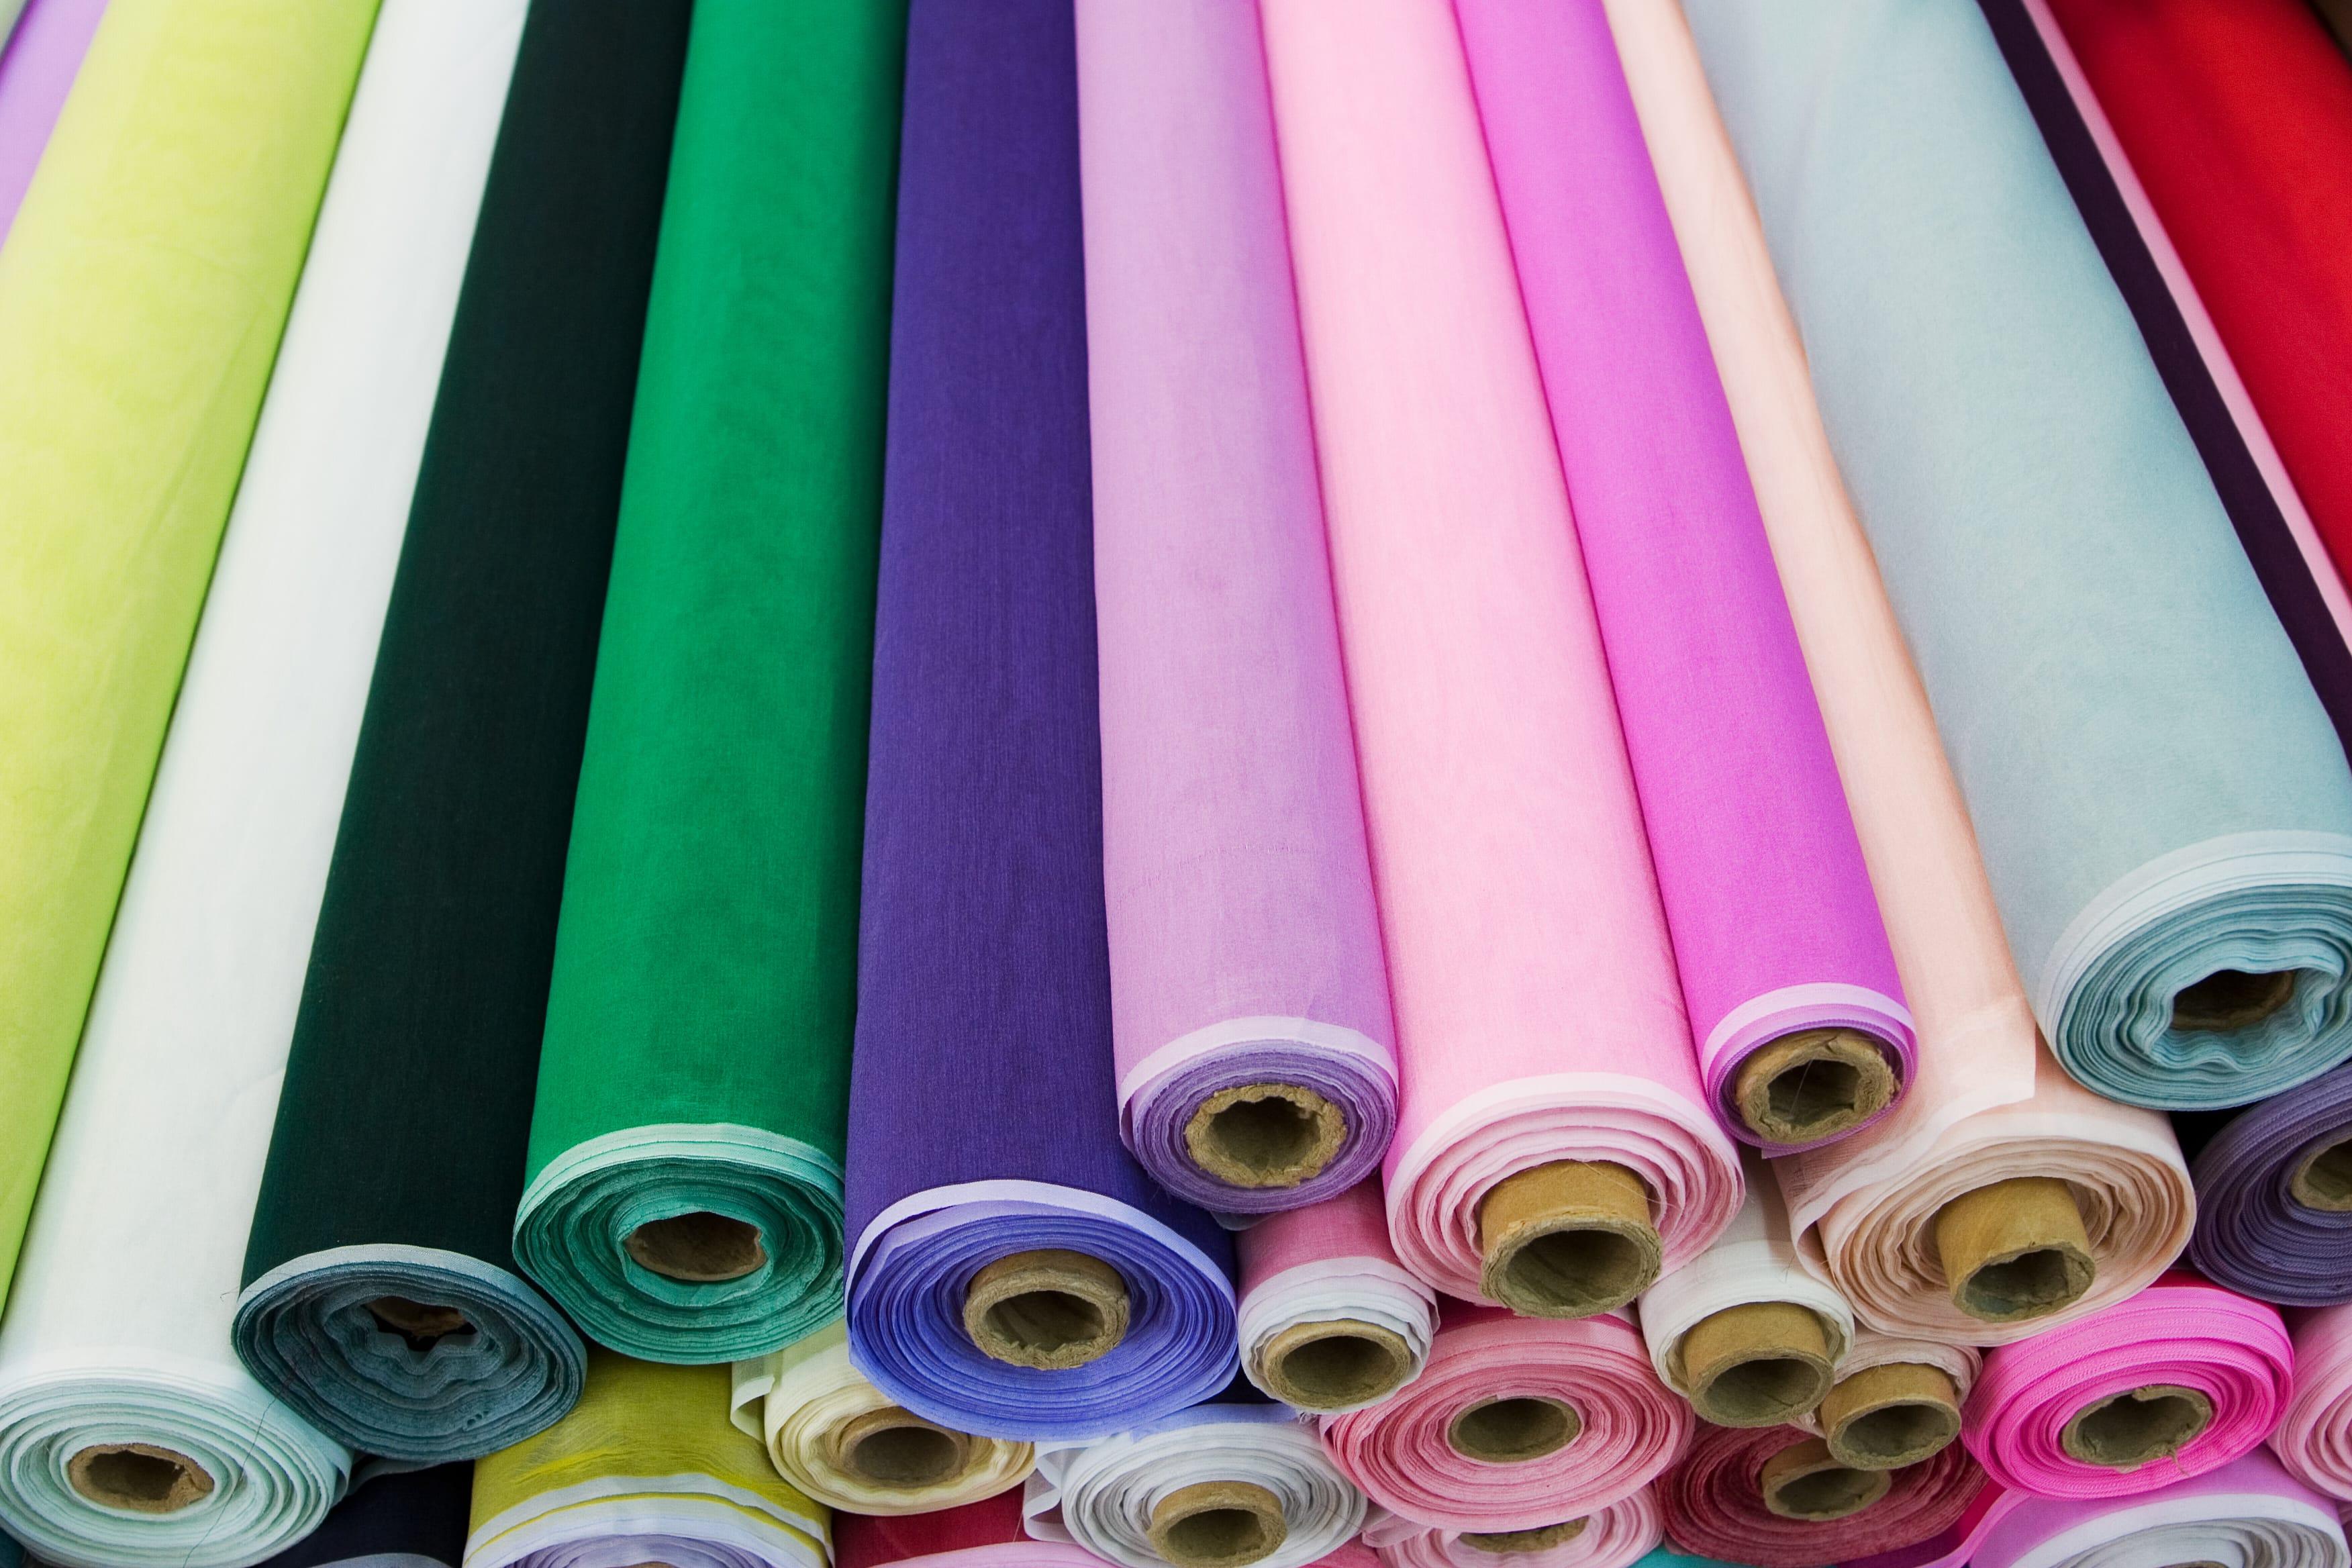 Ricette per tinture naturali dei tessuti